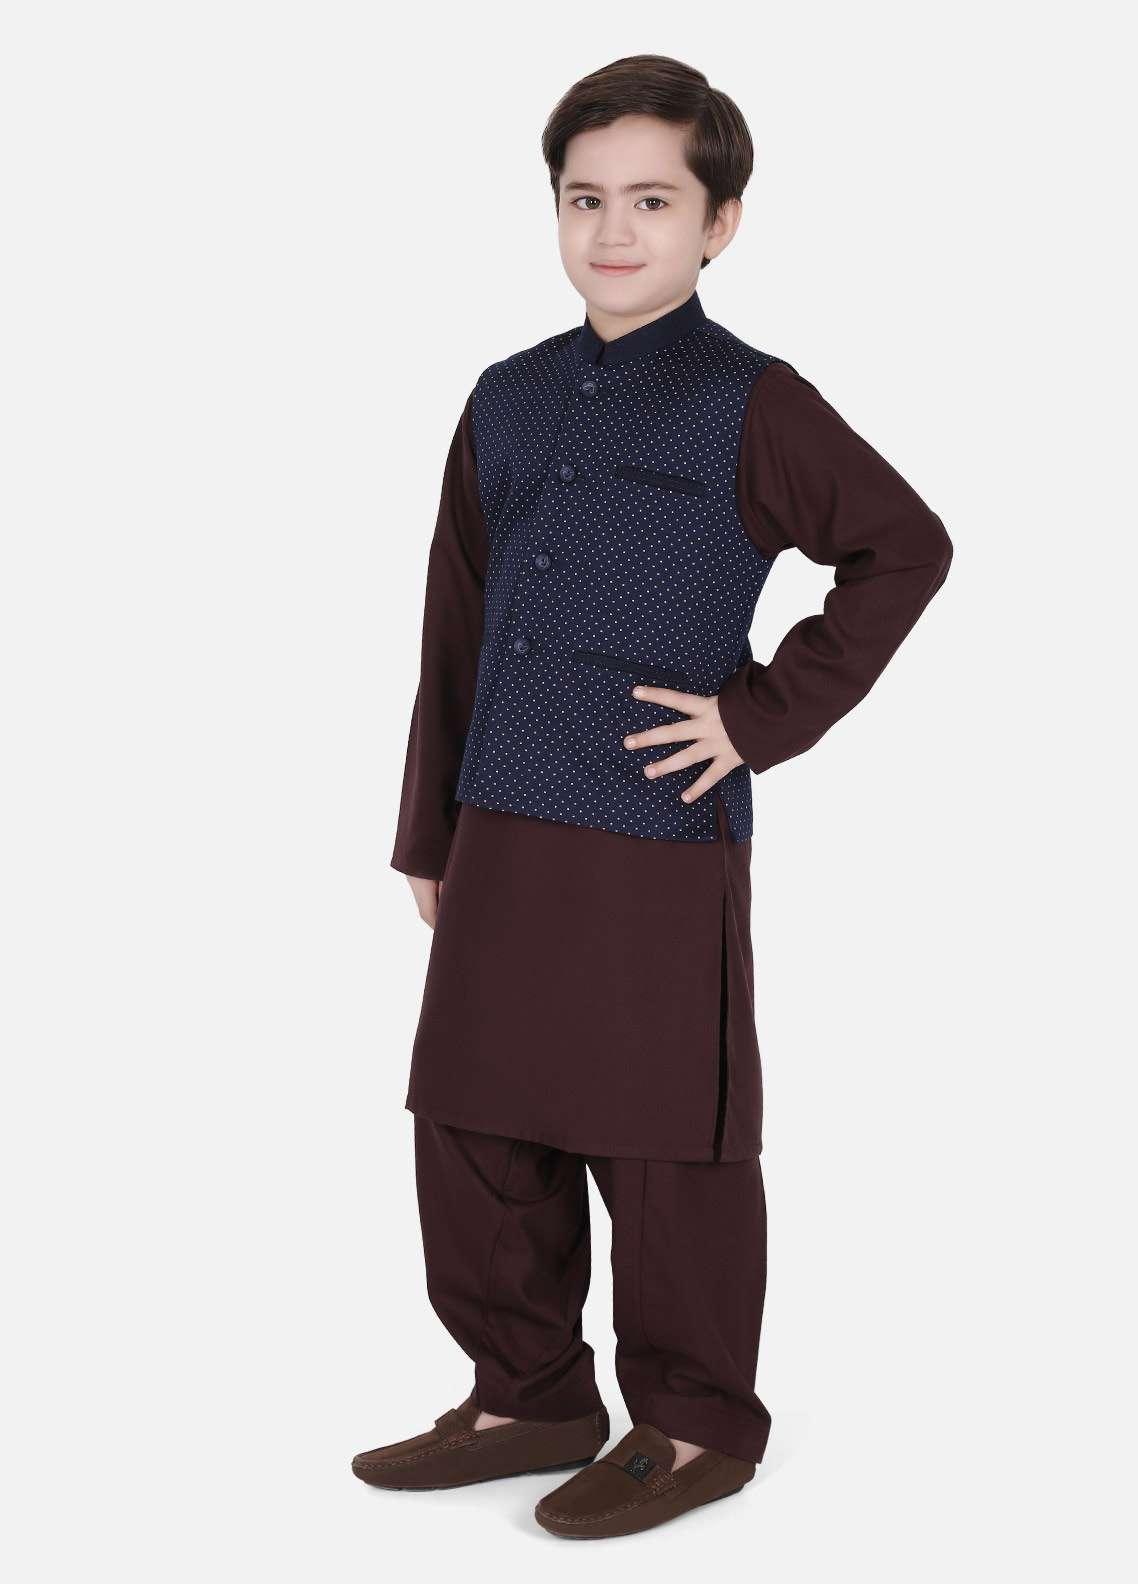 Edenrobe Cotton Fancy Boys Waistcoat Suits - Burgundy EDW18B 25078-1